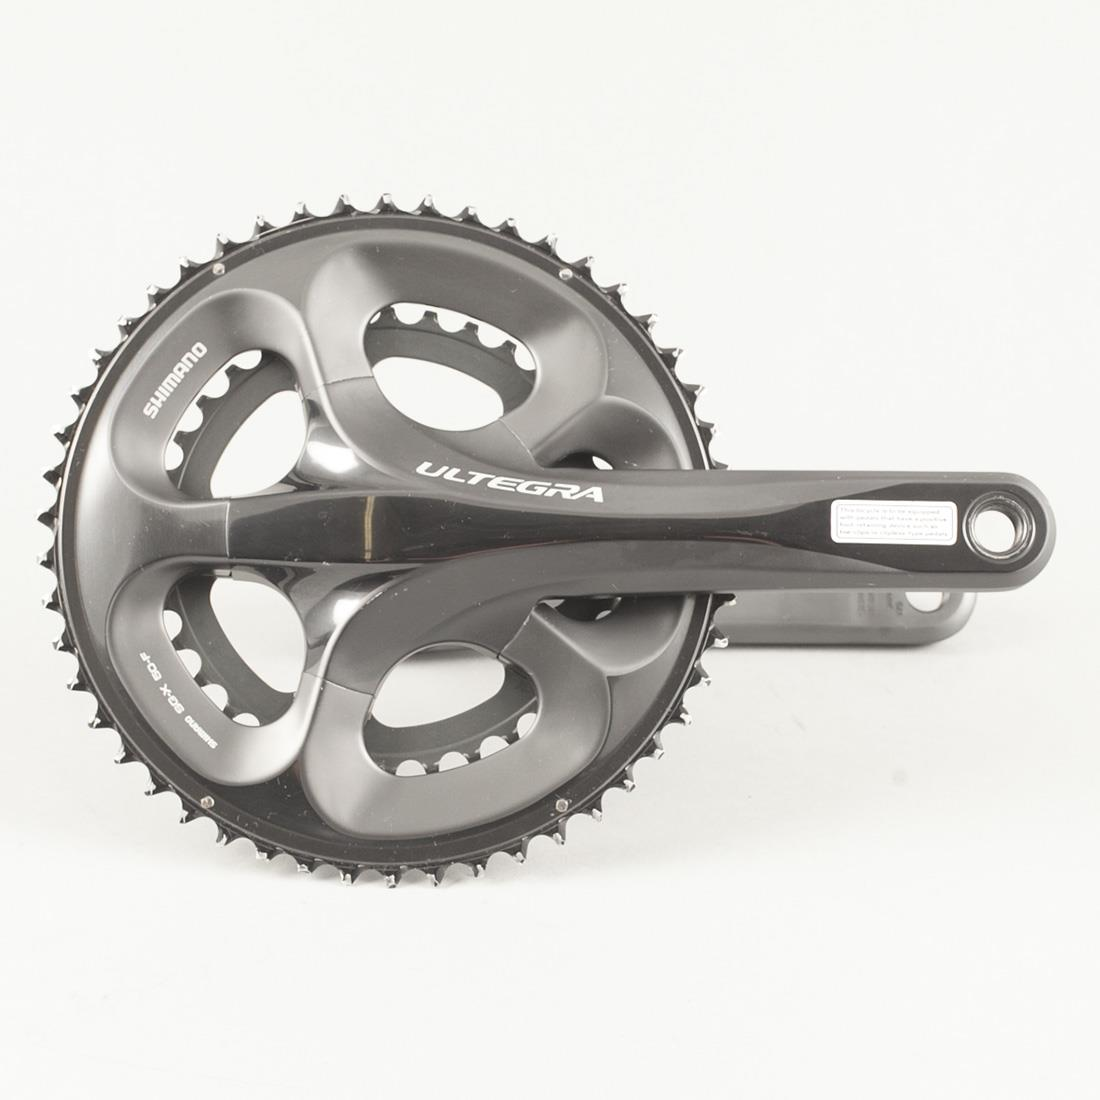 Used Shimano Ultegra FC-6750 Road Bike Compact Crankset 175mm 50/34t 9/10 Speed | eBay